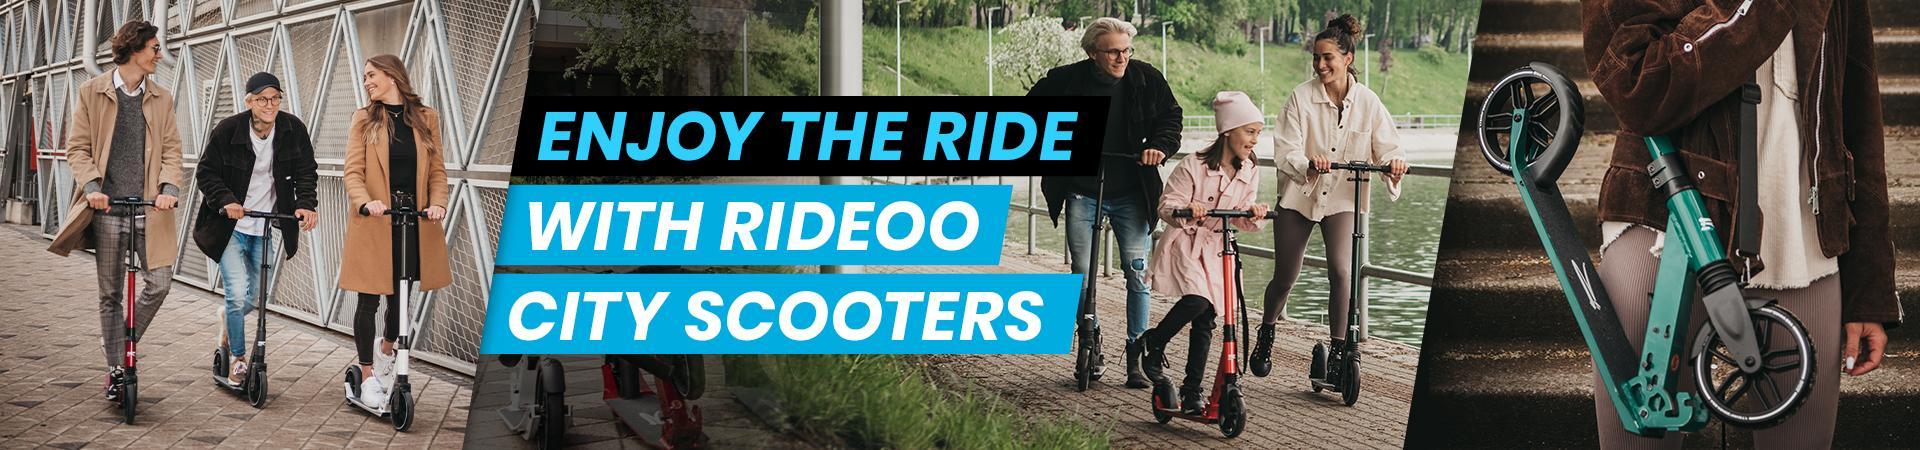 Rideoo pilsetas skrejriteņi